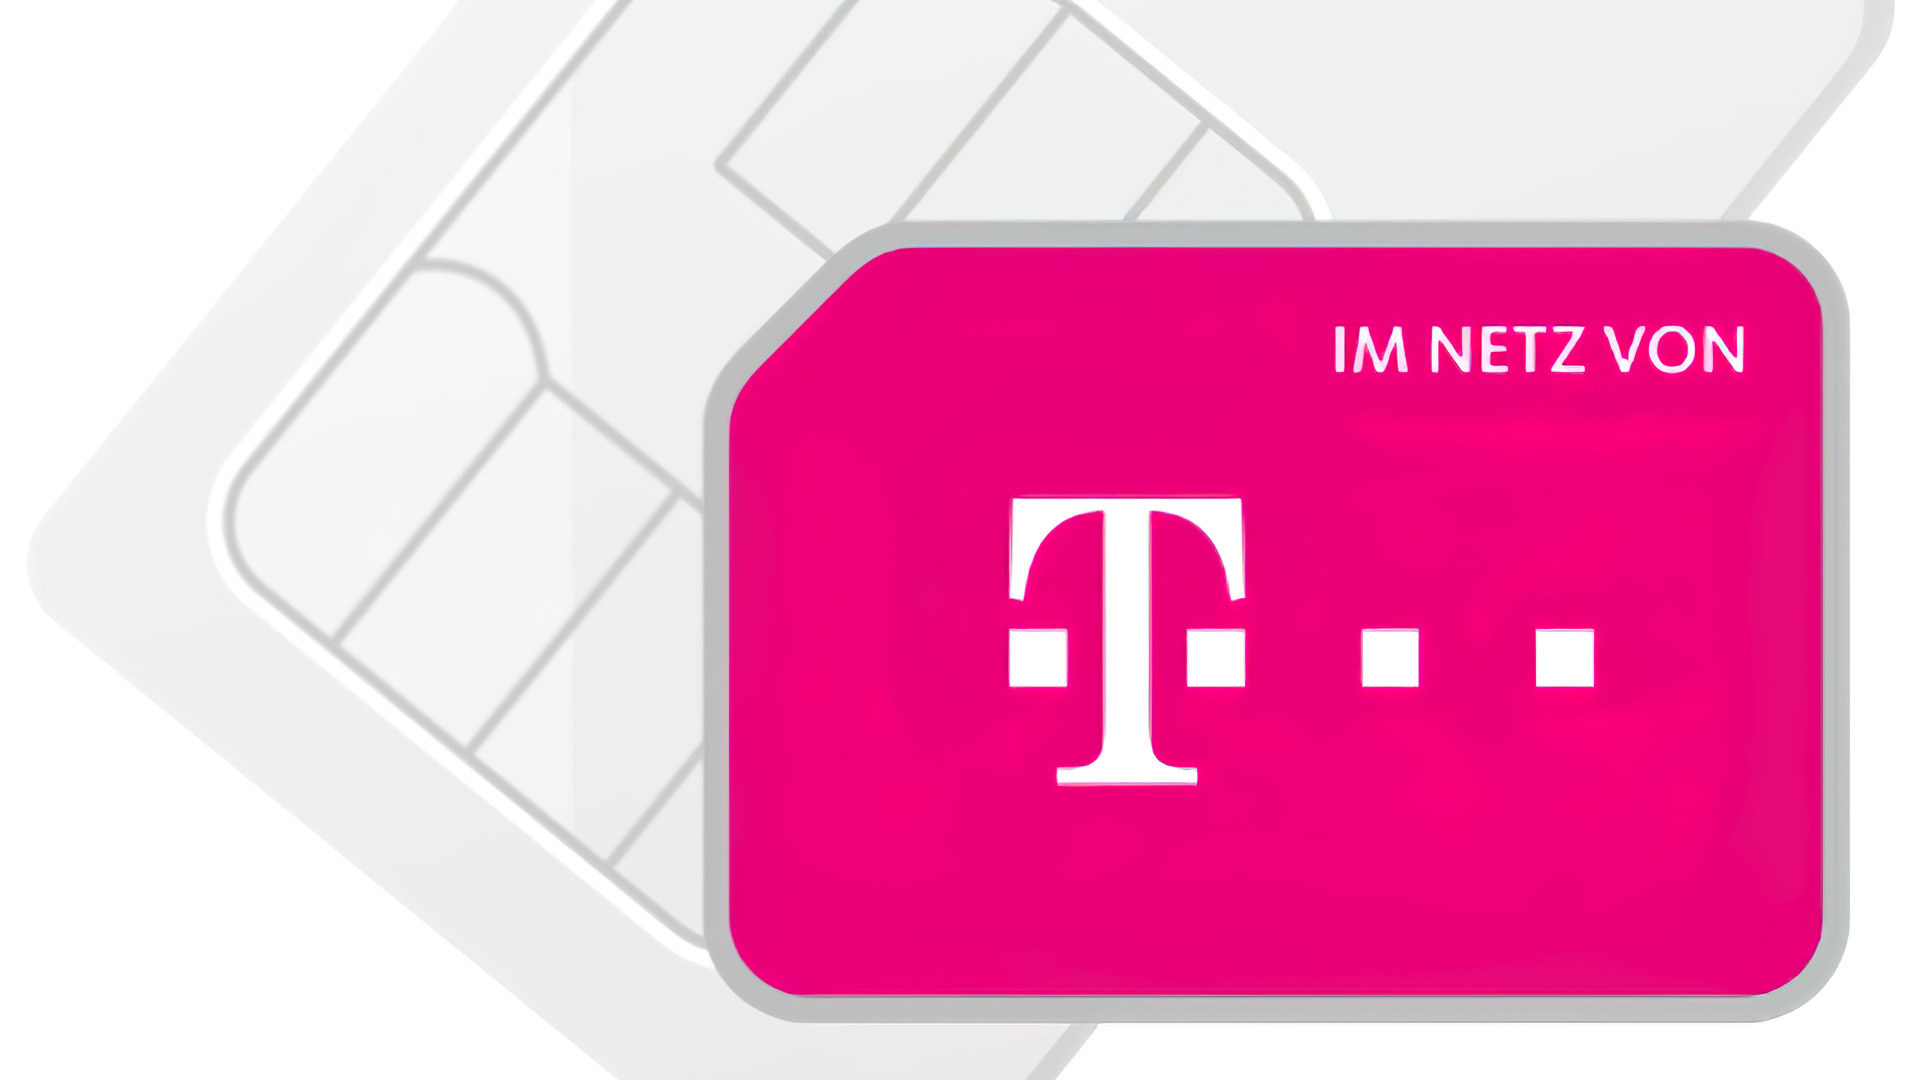 Mobilfunk, Telekom, Vodafone, Mobilcom-Debitel